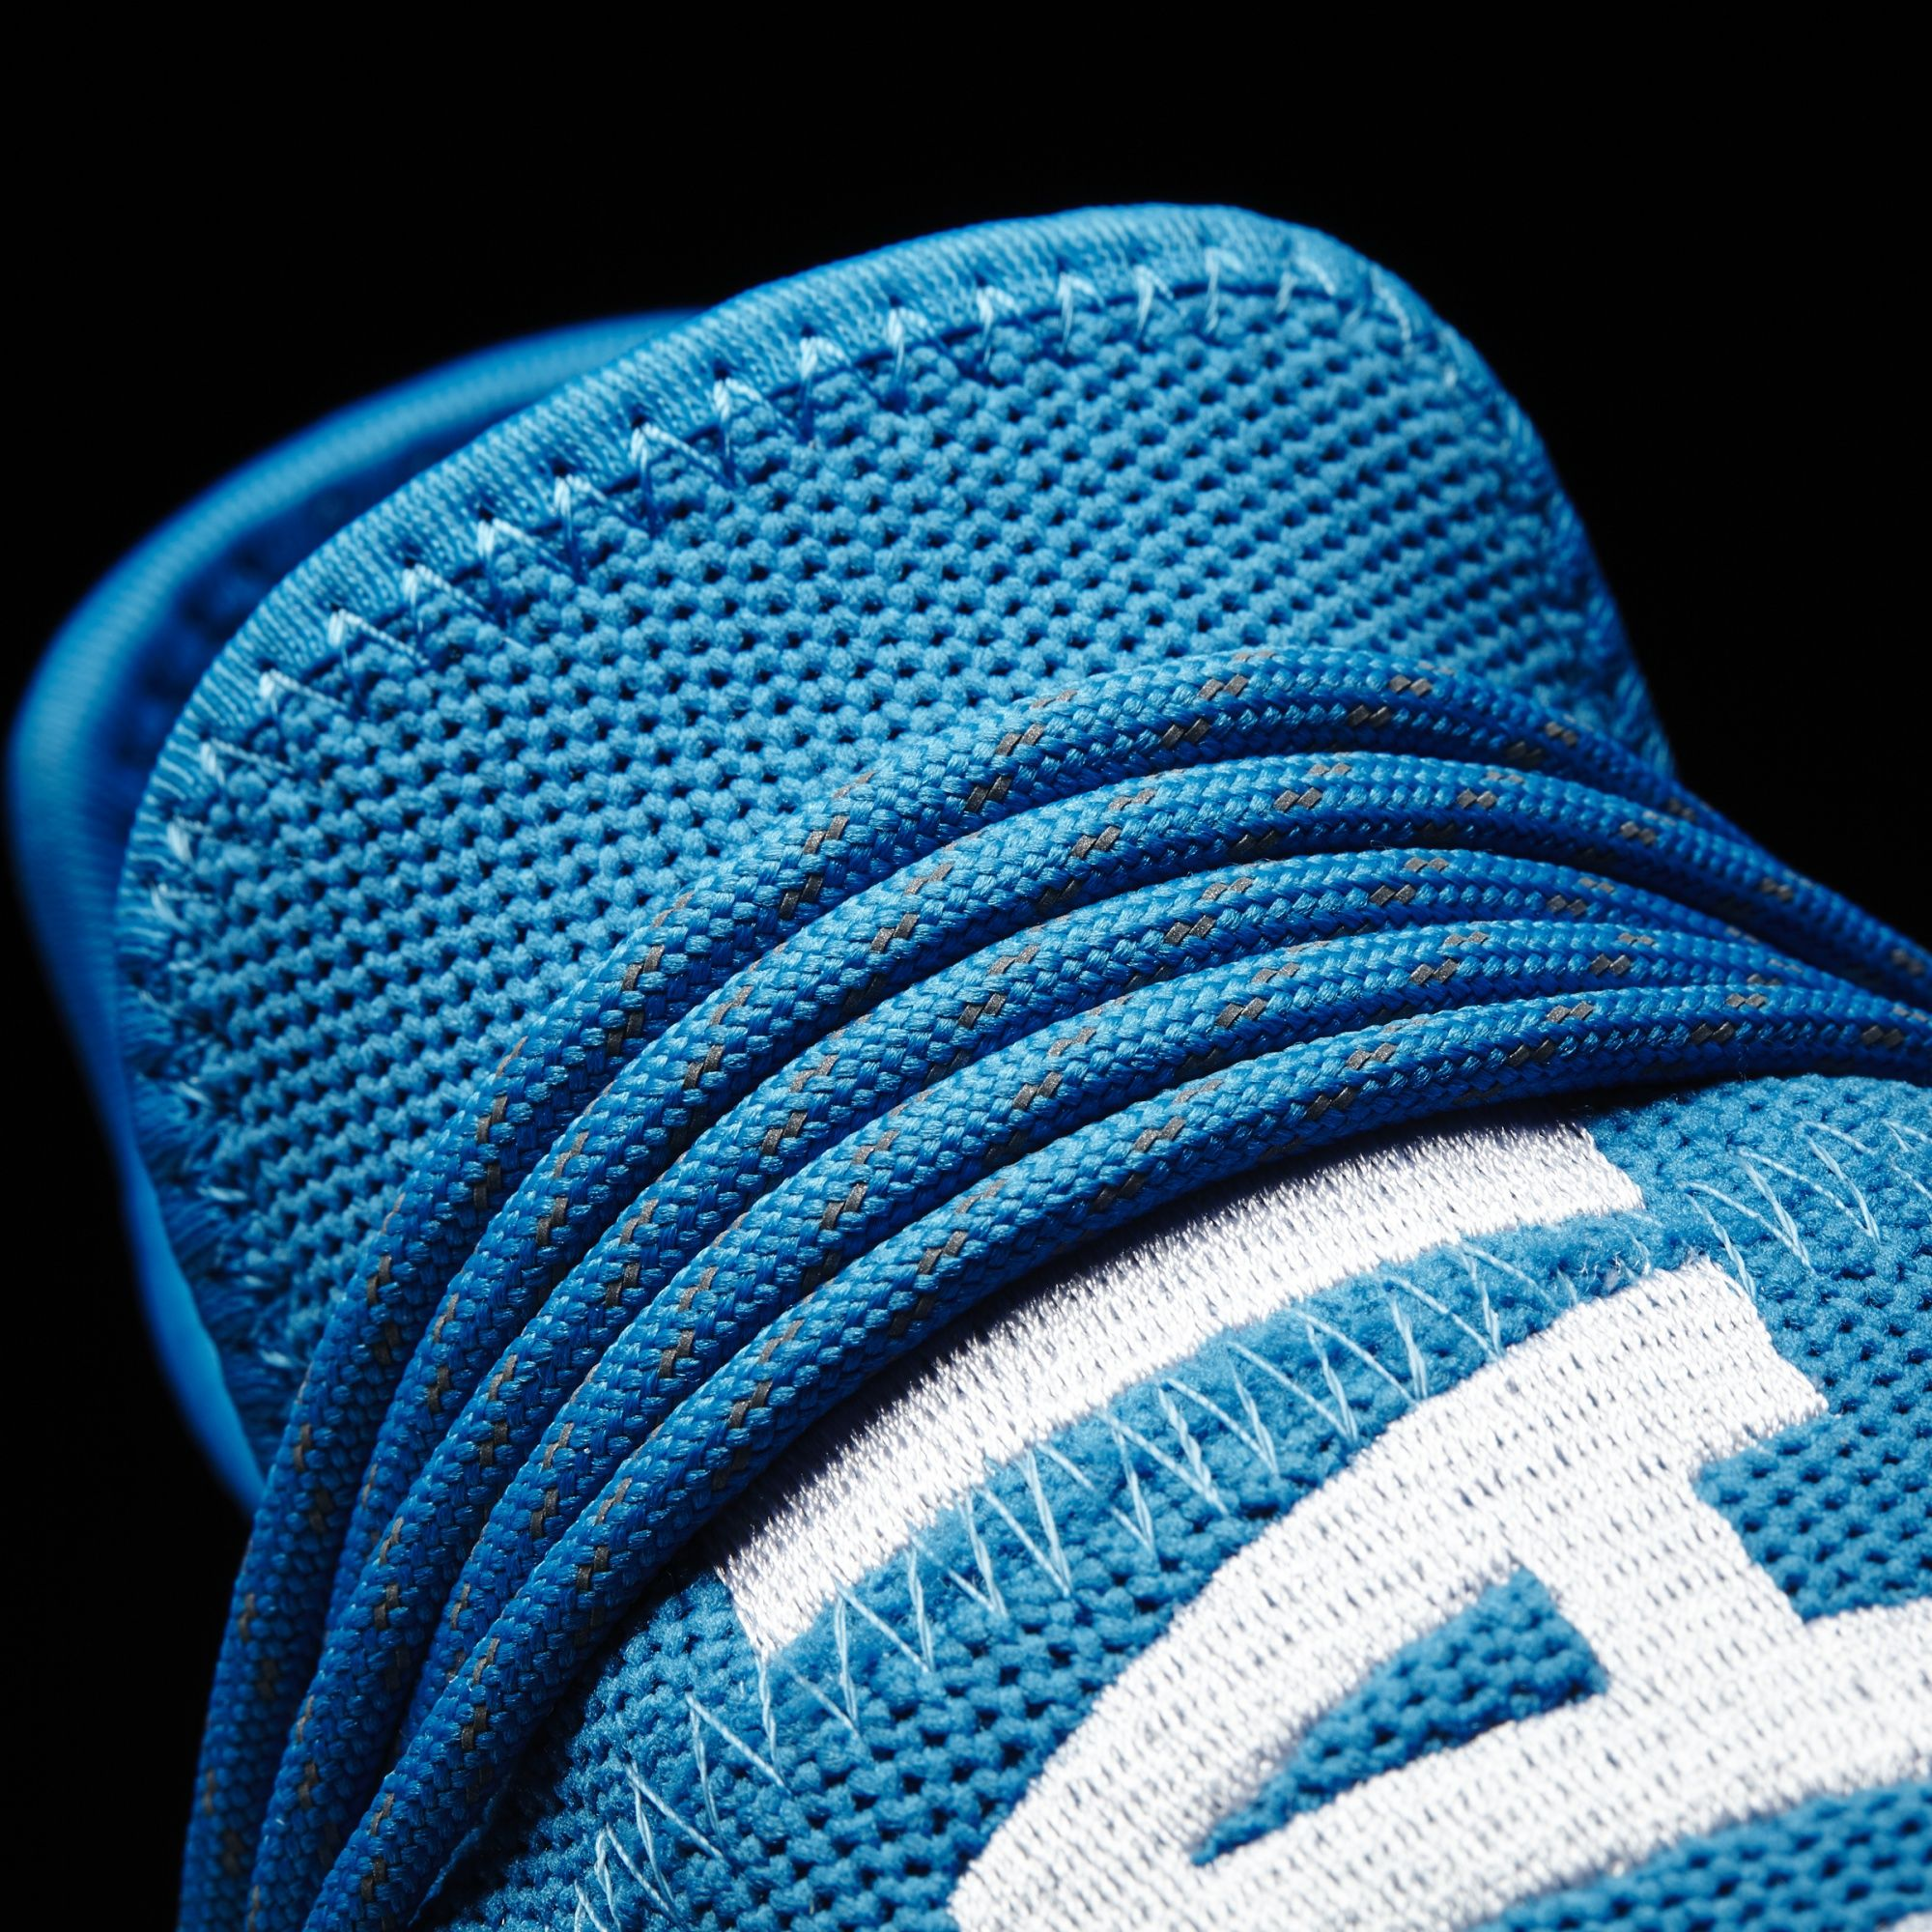 Blue Pharrell adidas NMD Human Race Lace